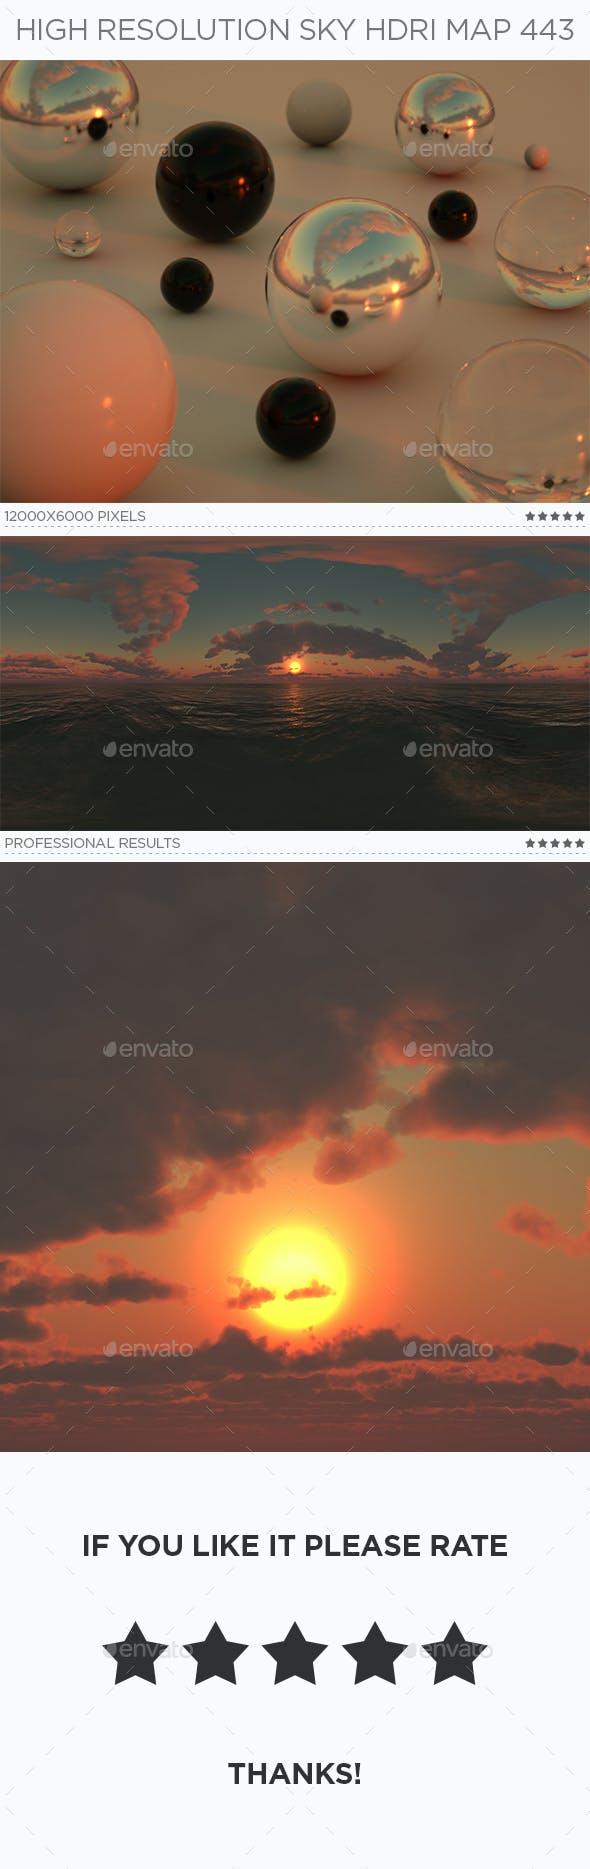 High Resolution Sky HDRi Map 443 - 3DOcean Item for Sale